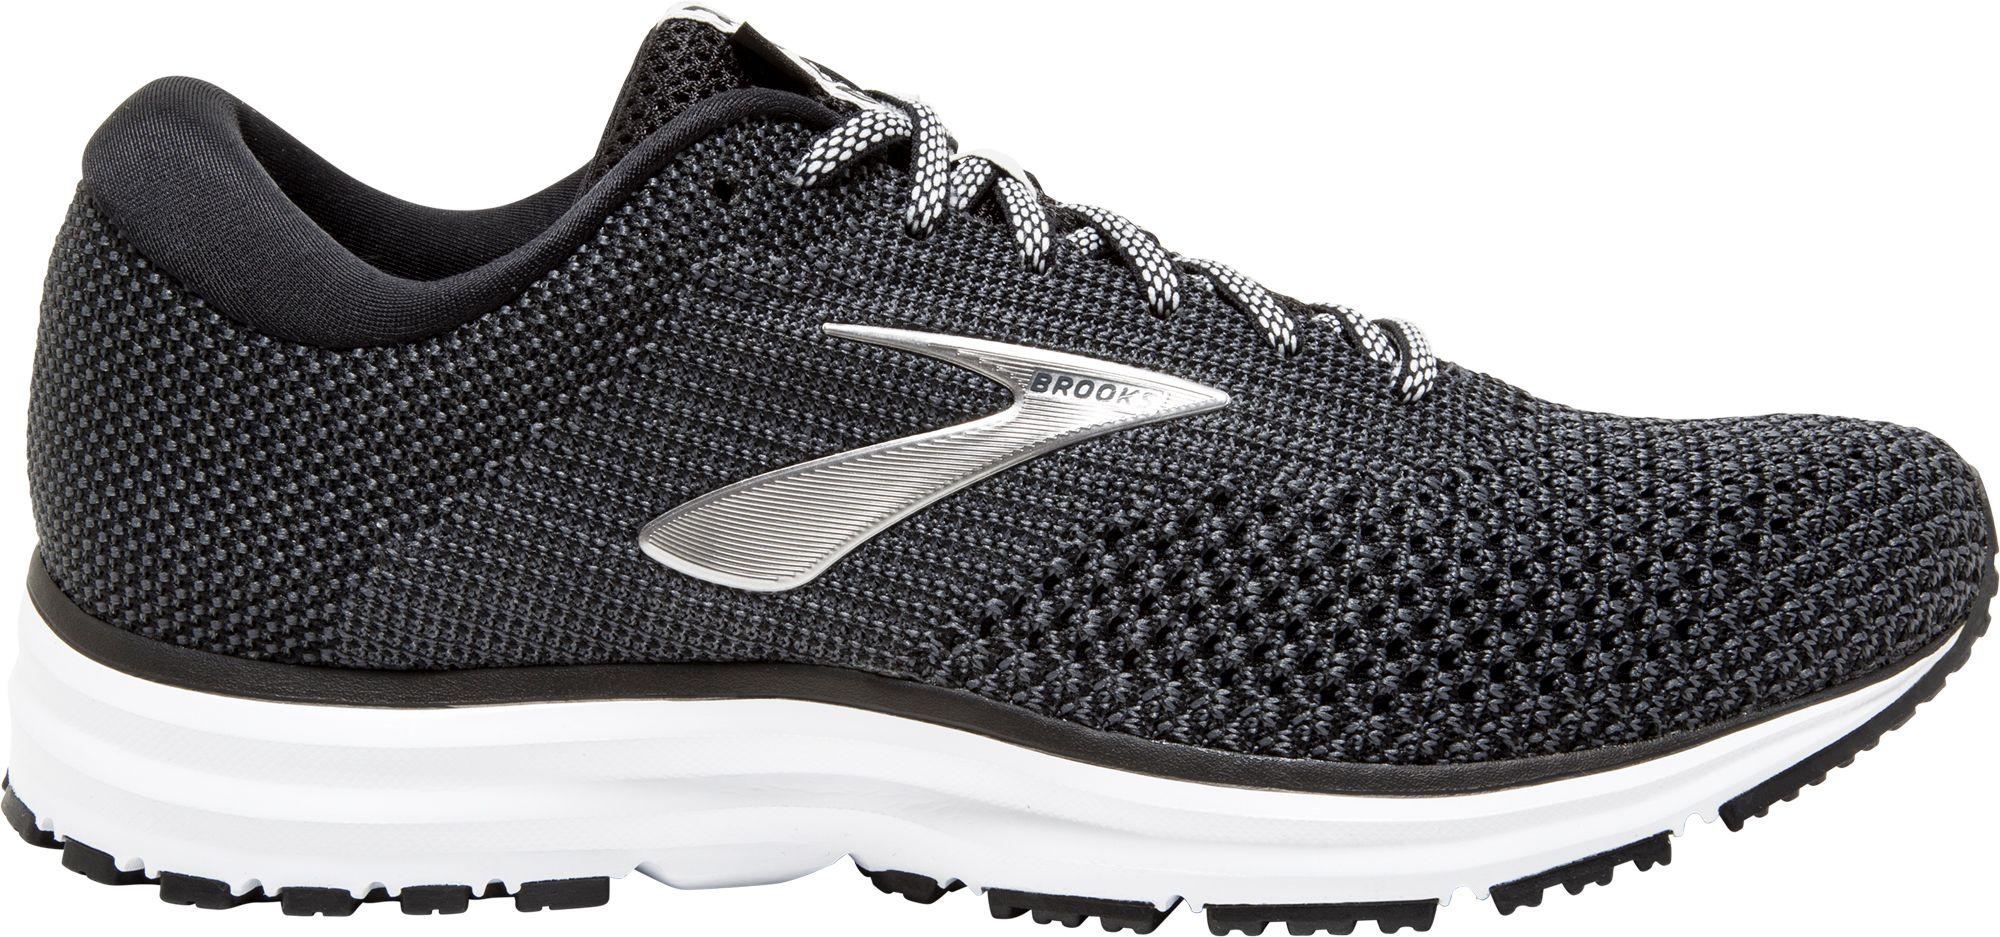 black brooks running shoes